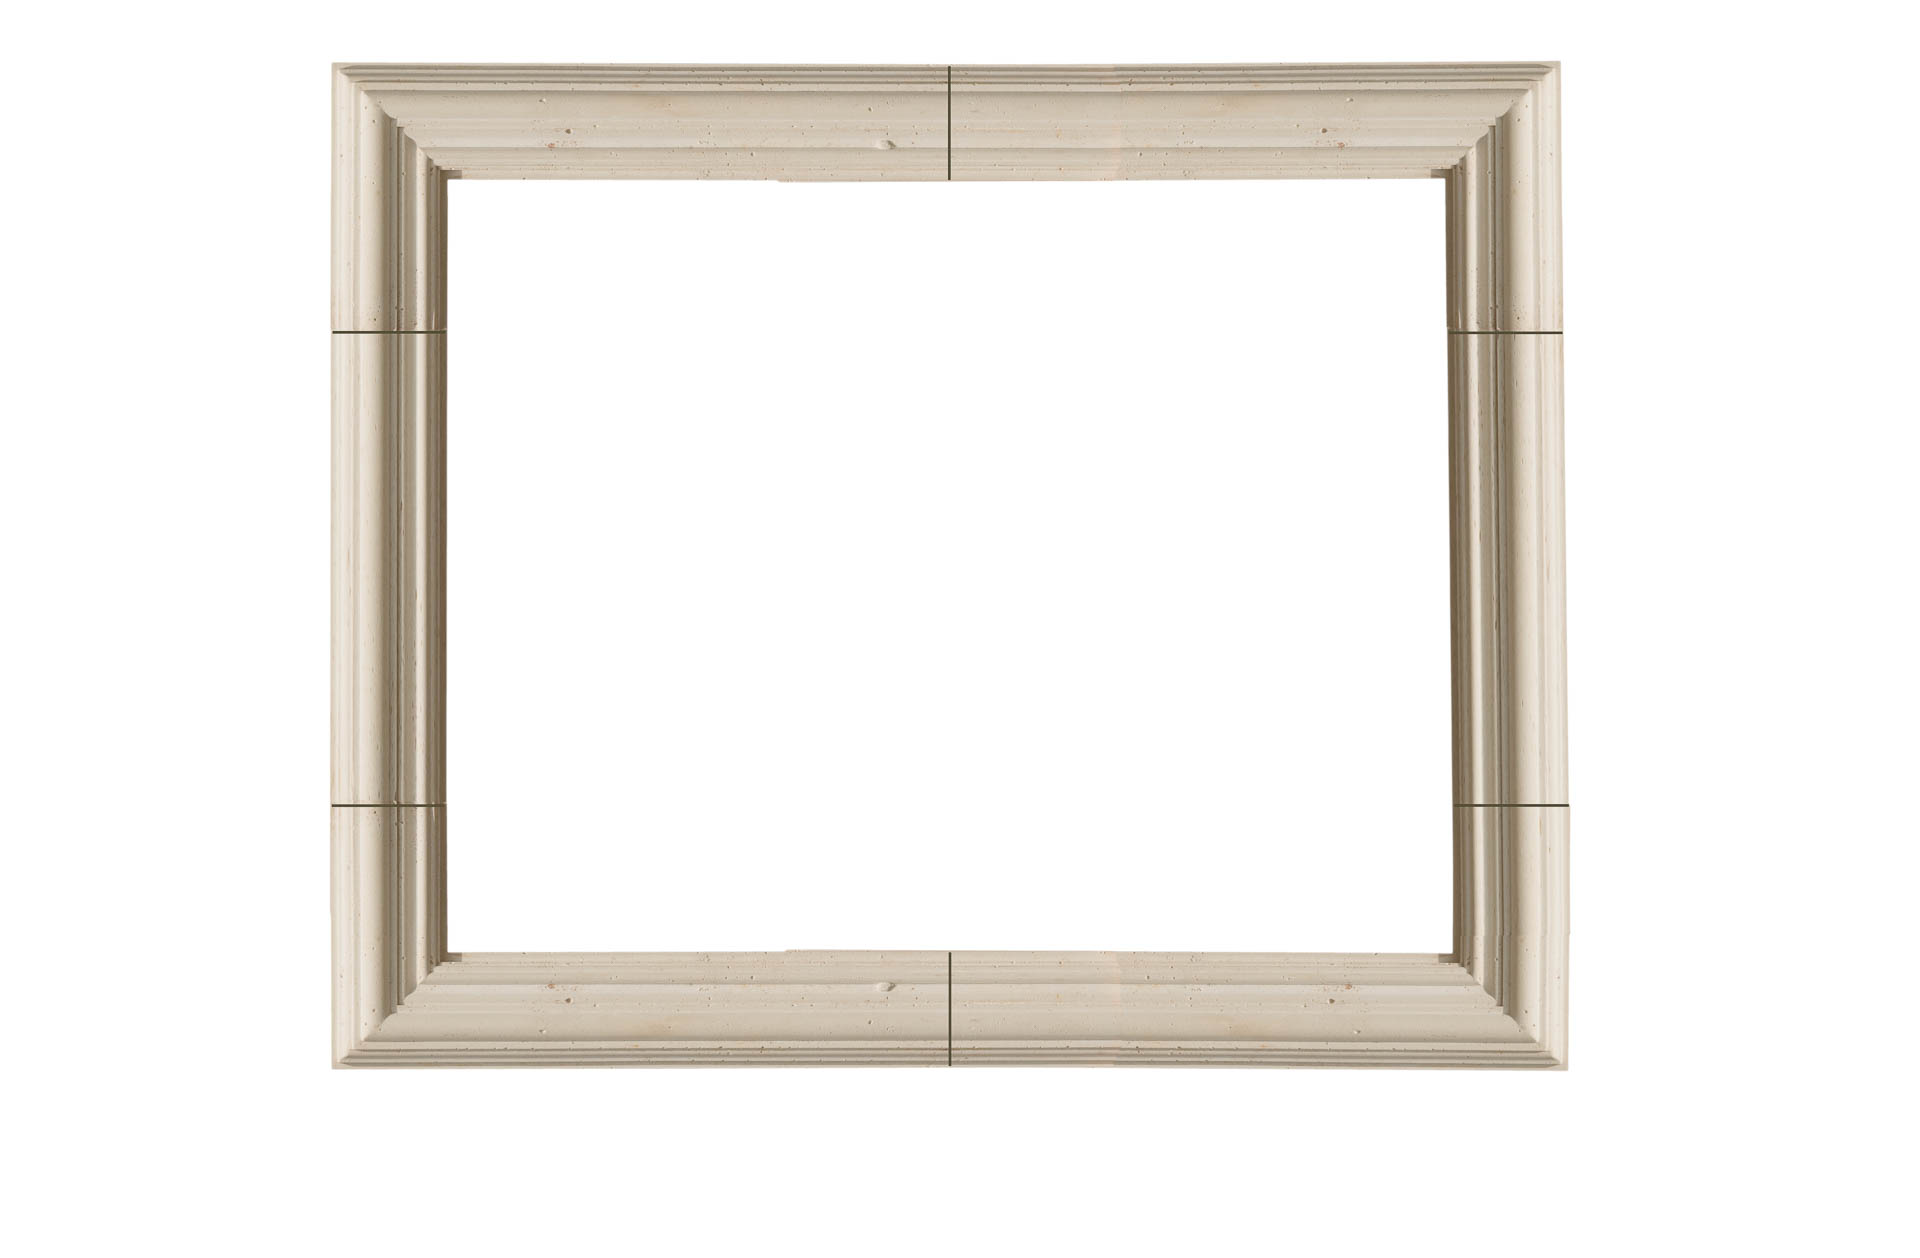 Trim Kit Da Vinci Fireplace Mantels